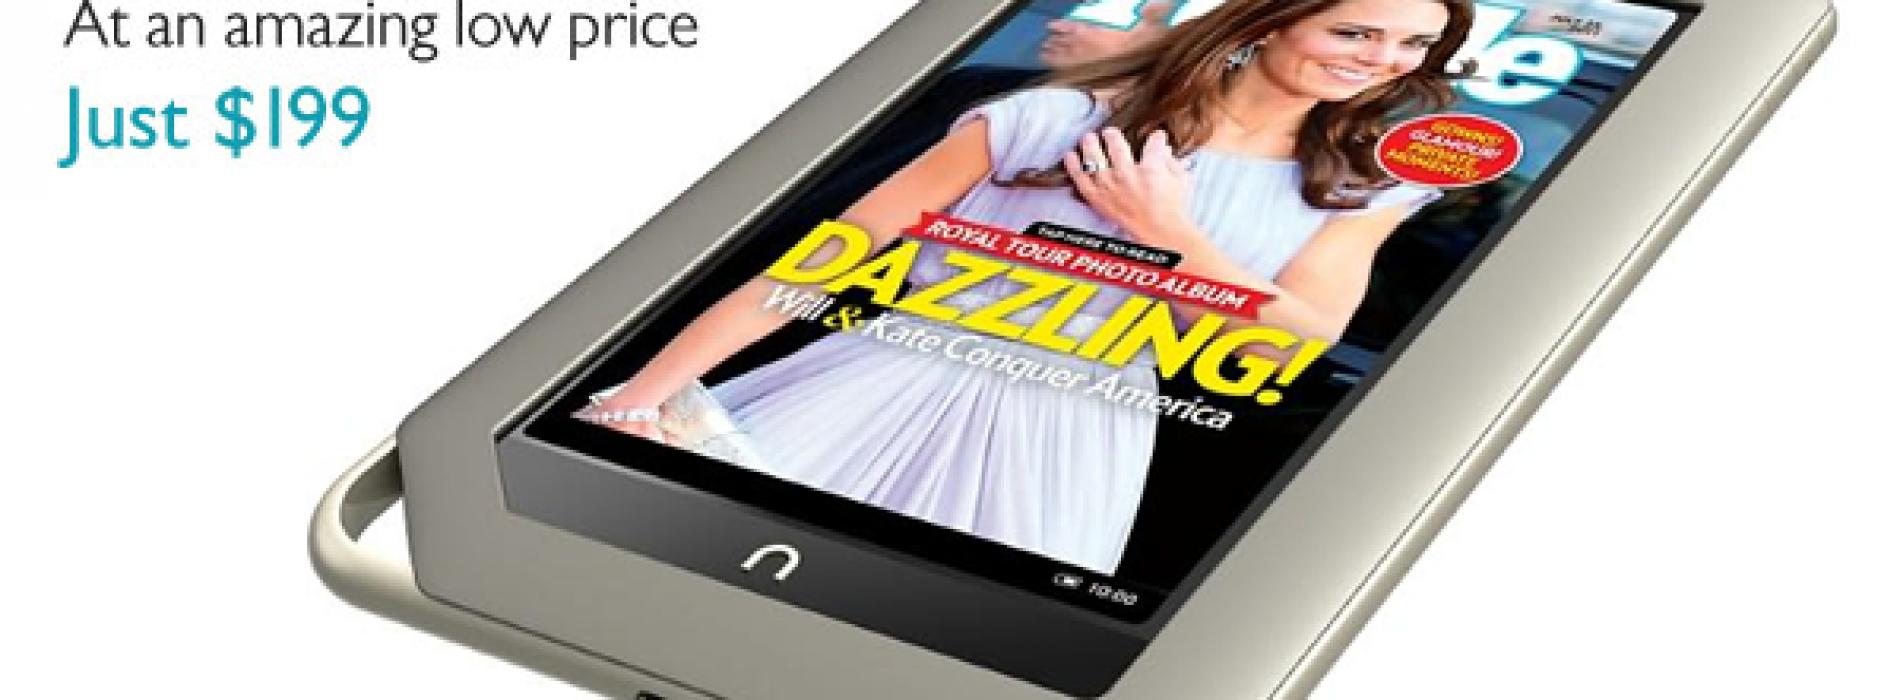 Barnes & Noble announces $199 Nook Tablet, $169 Nook Color